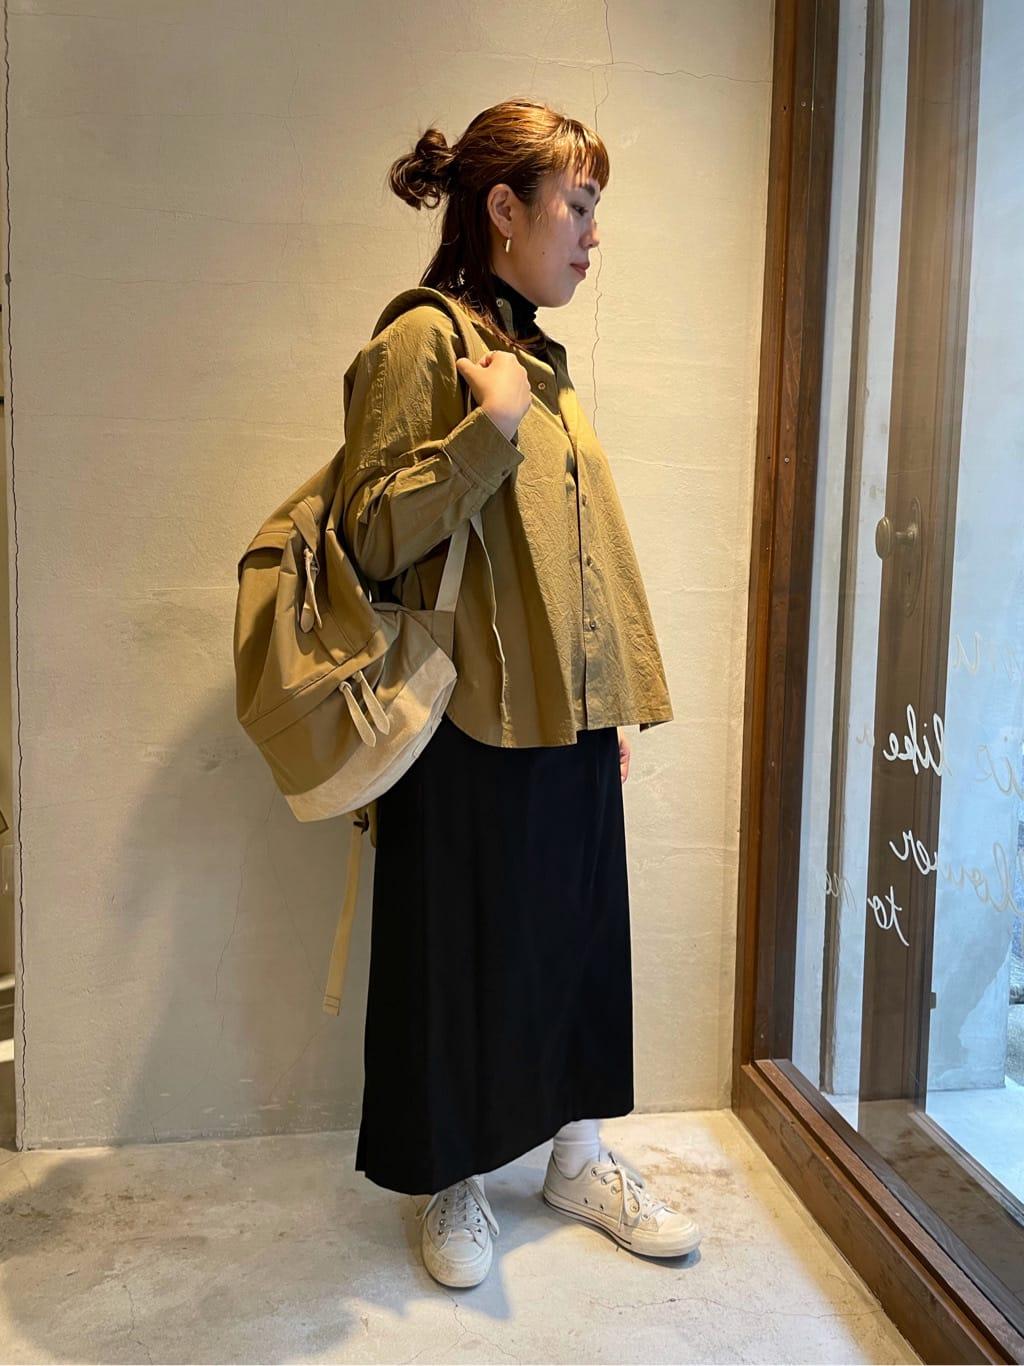 yuni 神戸路面 身長:154cm 2021.09.26